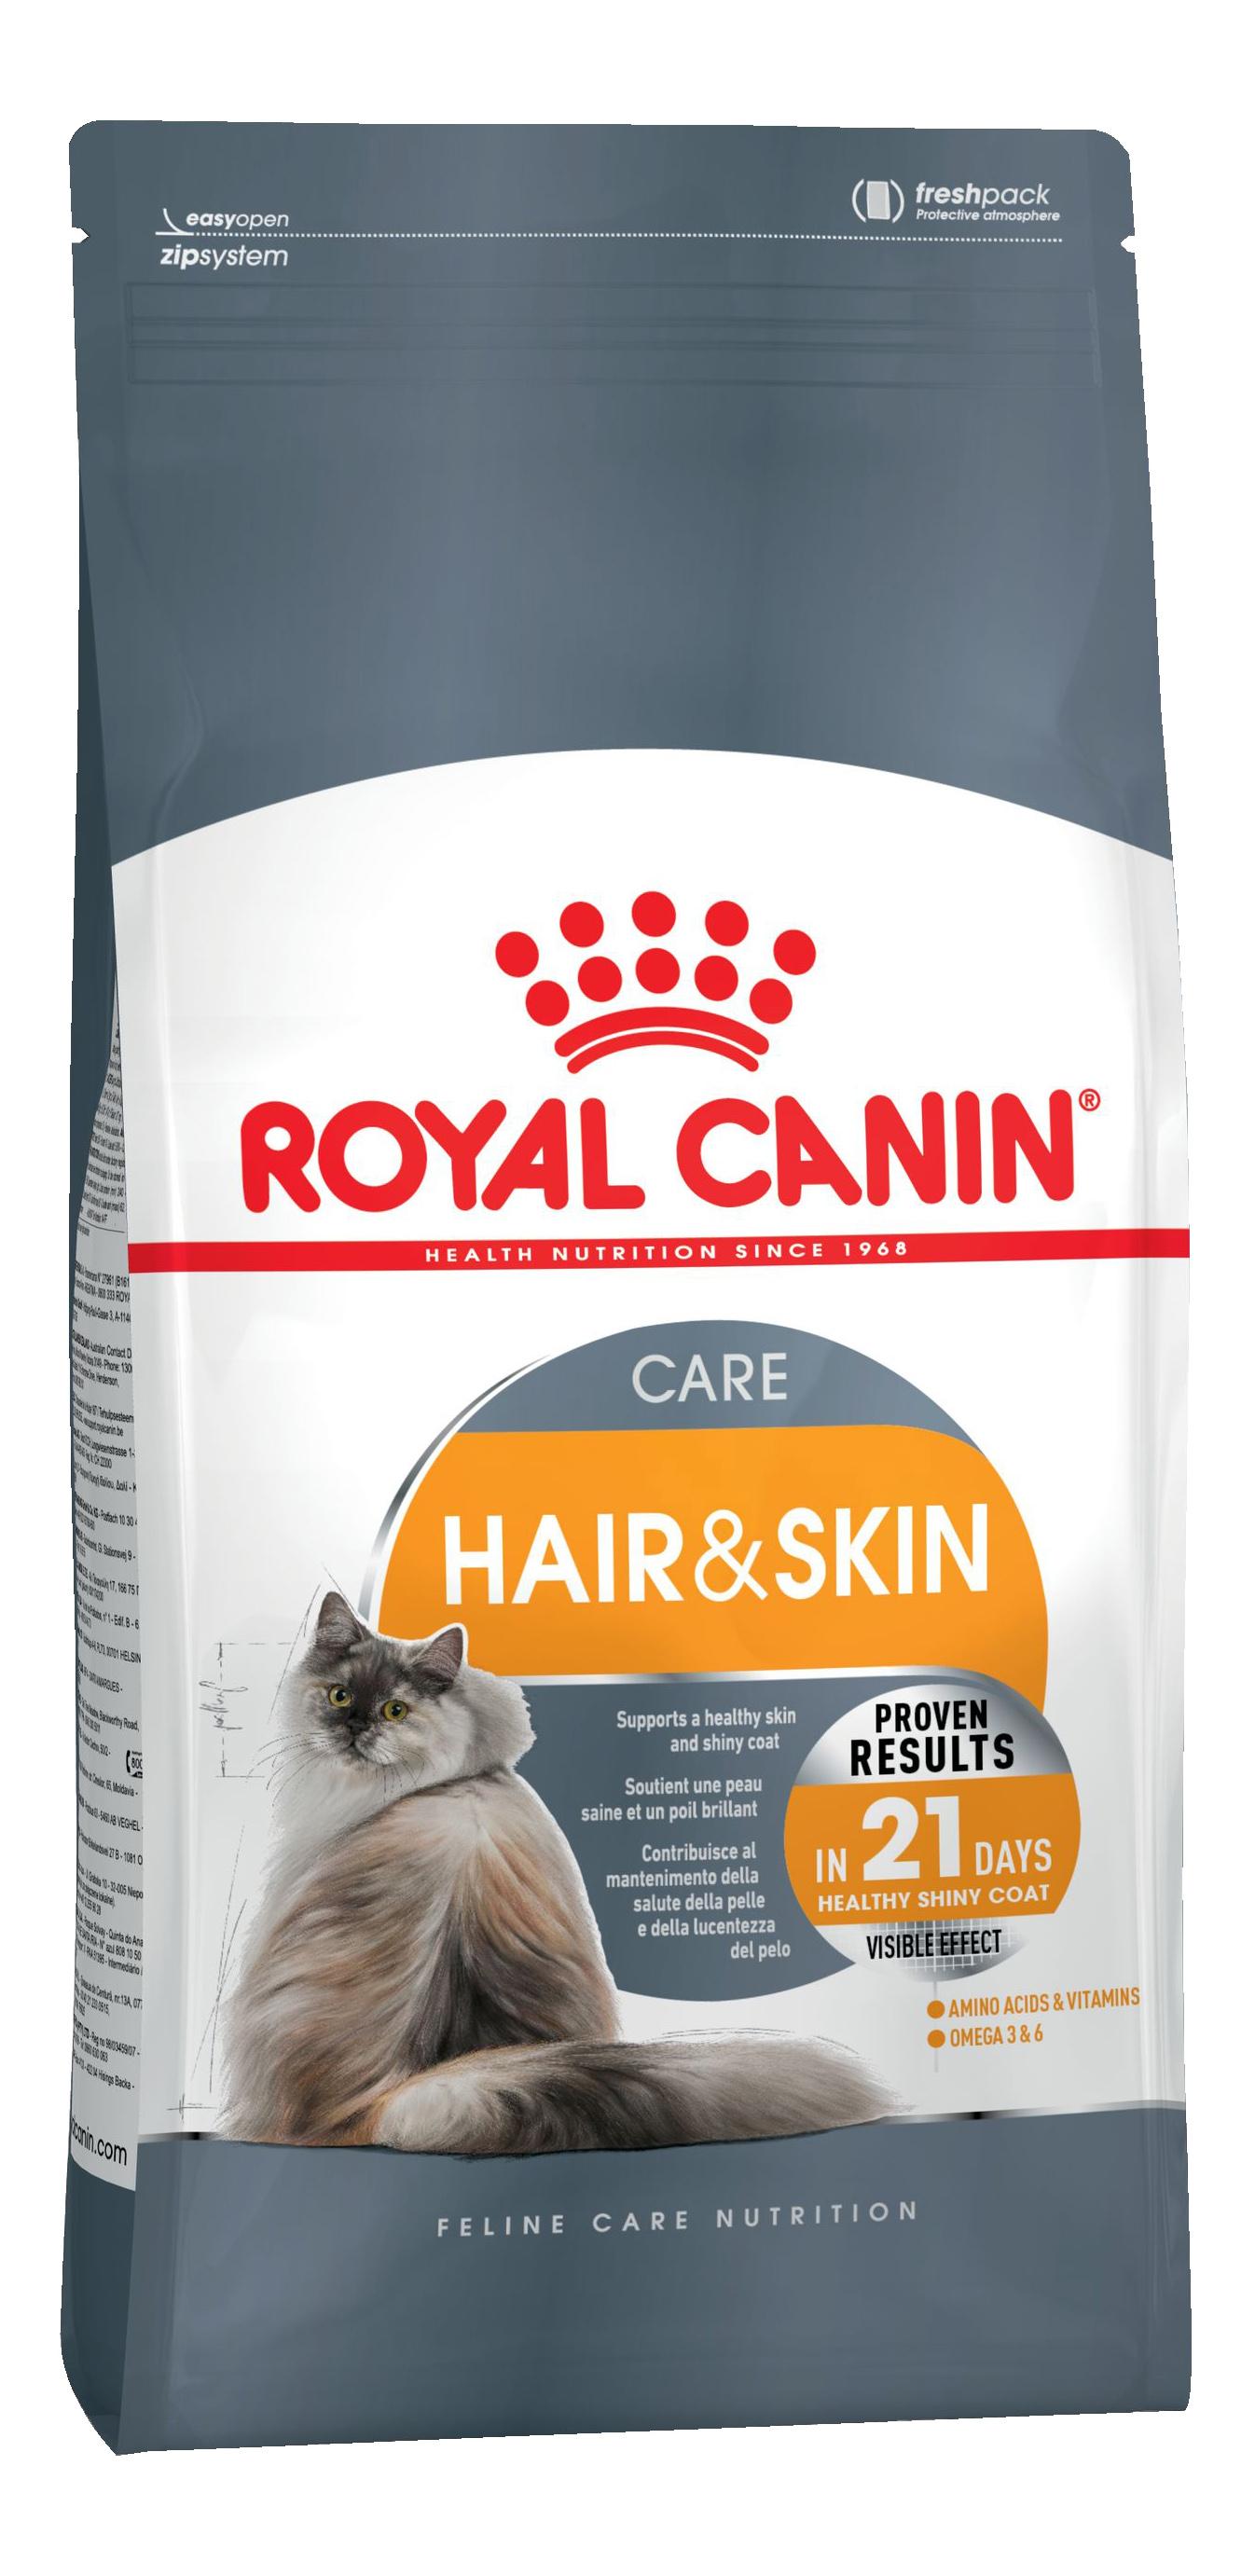 ROYAL CANIN HAIR #AND# SKIN CARE